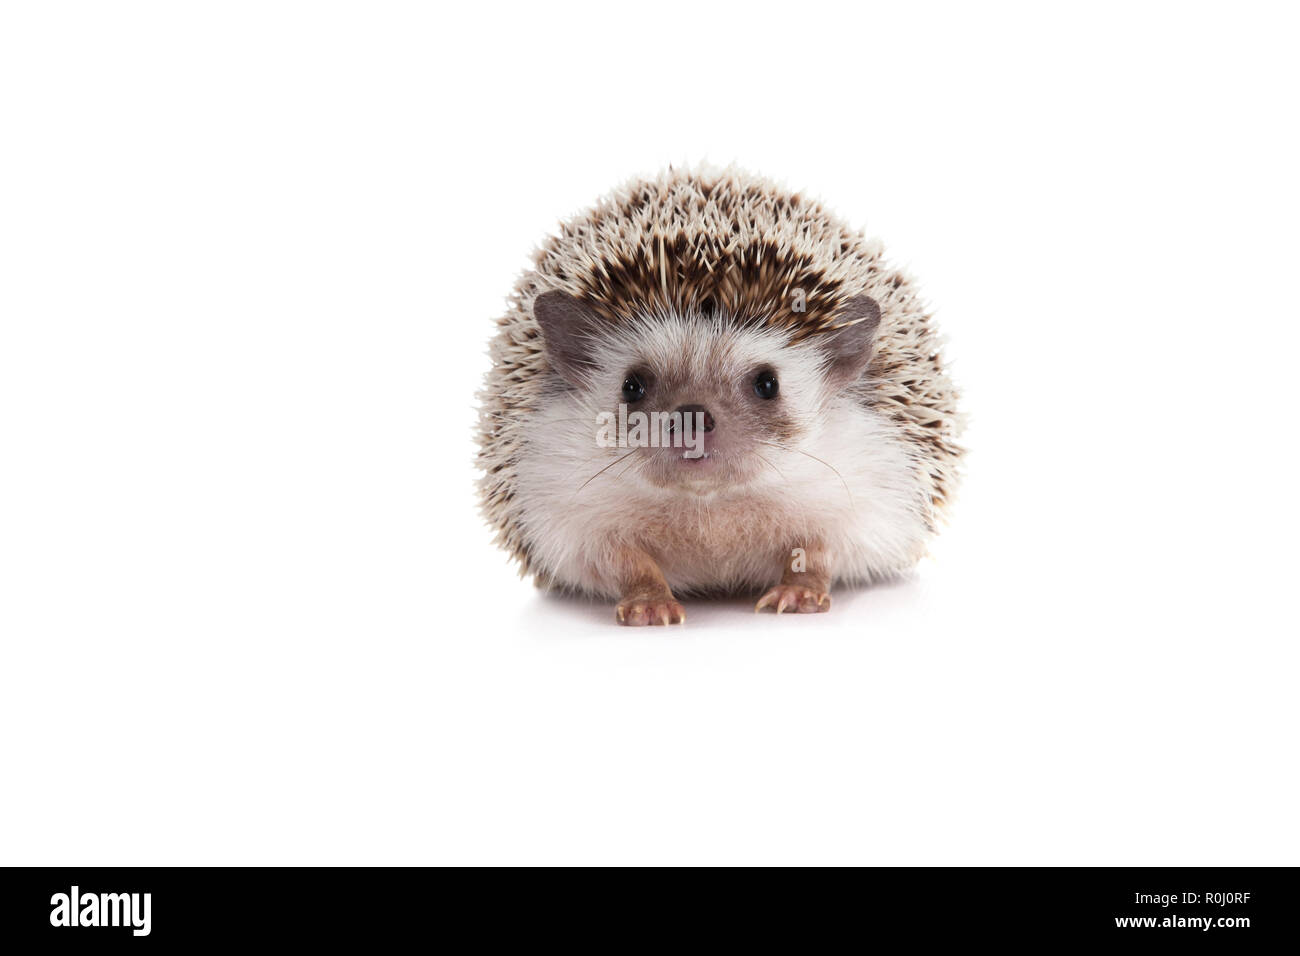 Pygm hedgehog, - Stock Image